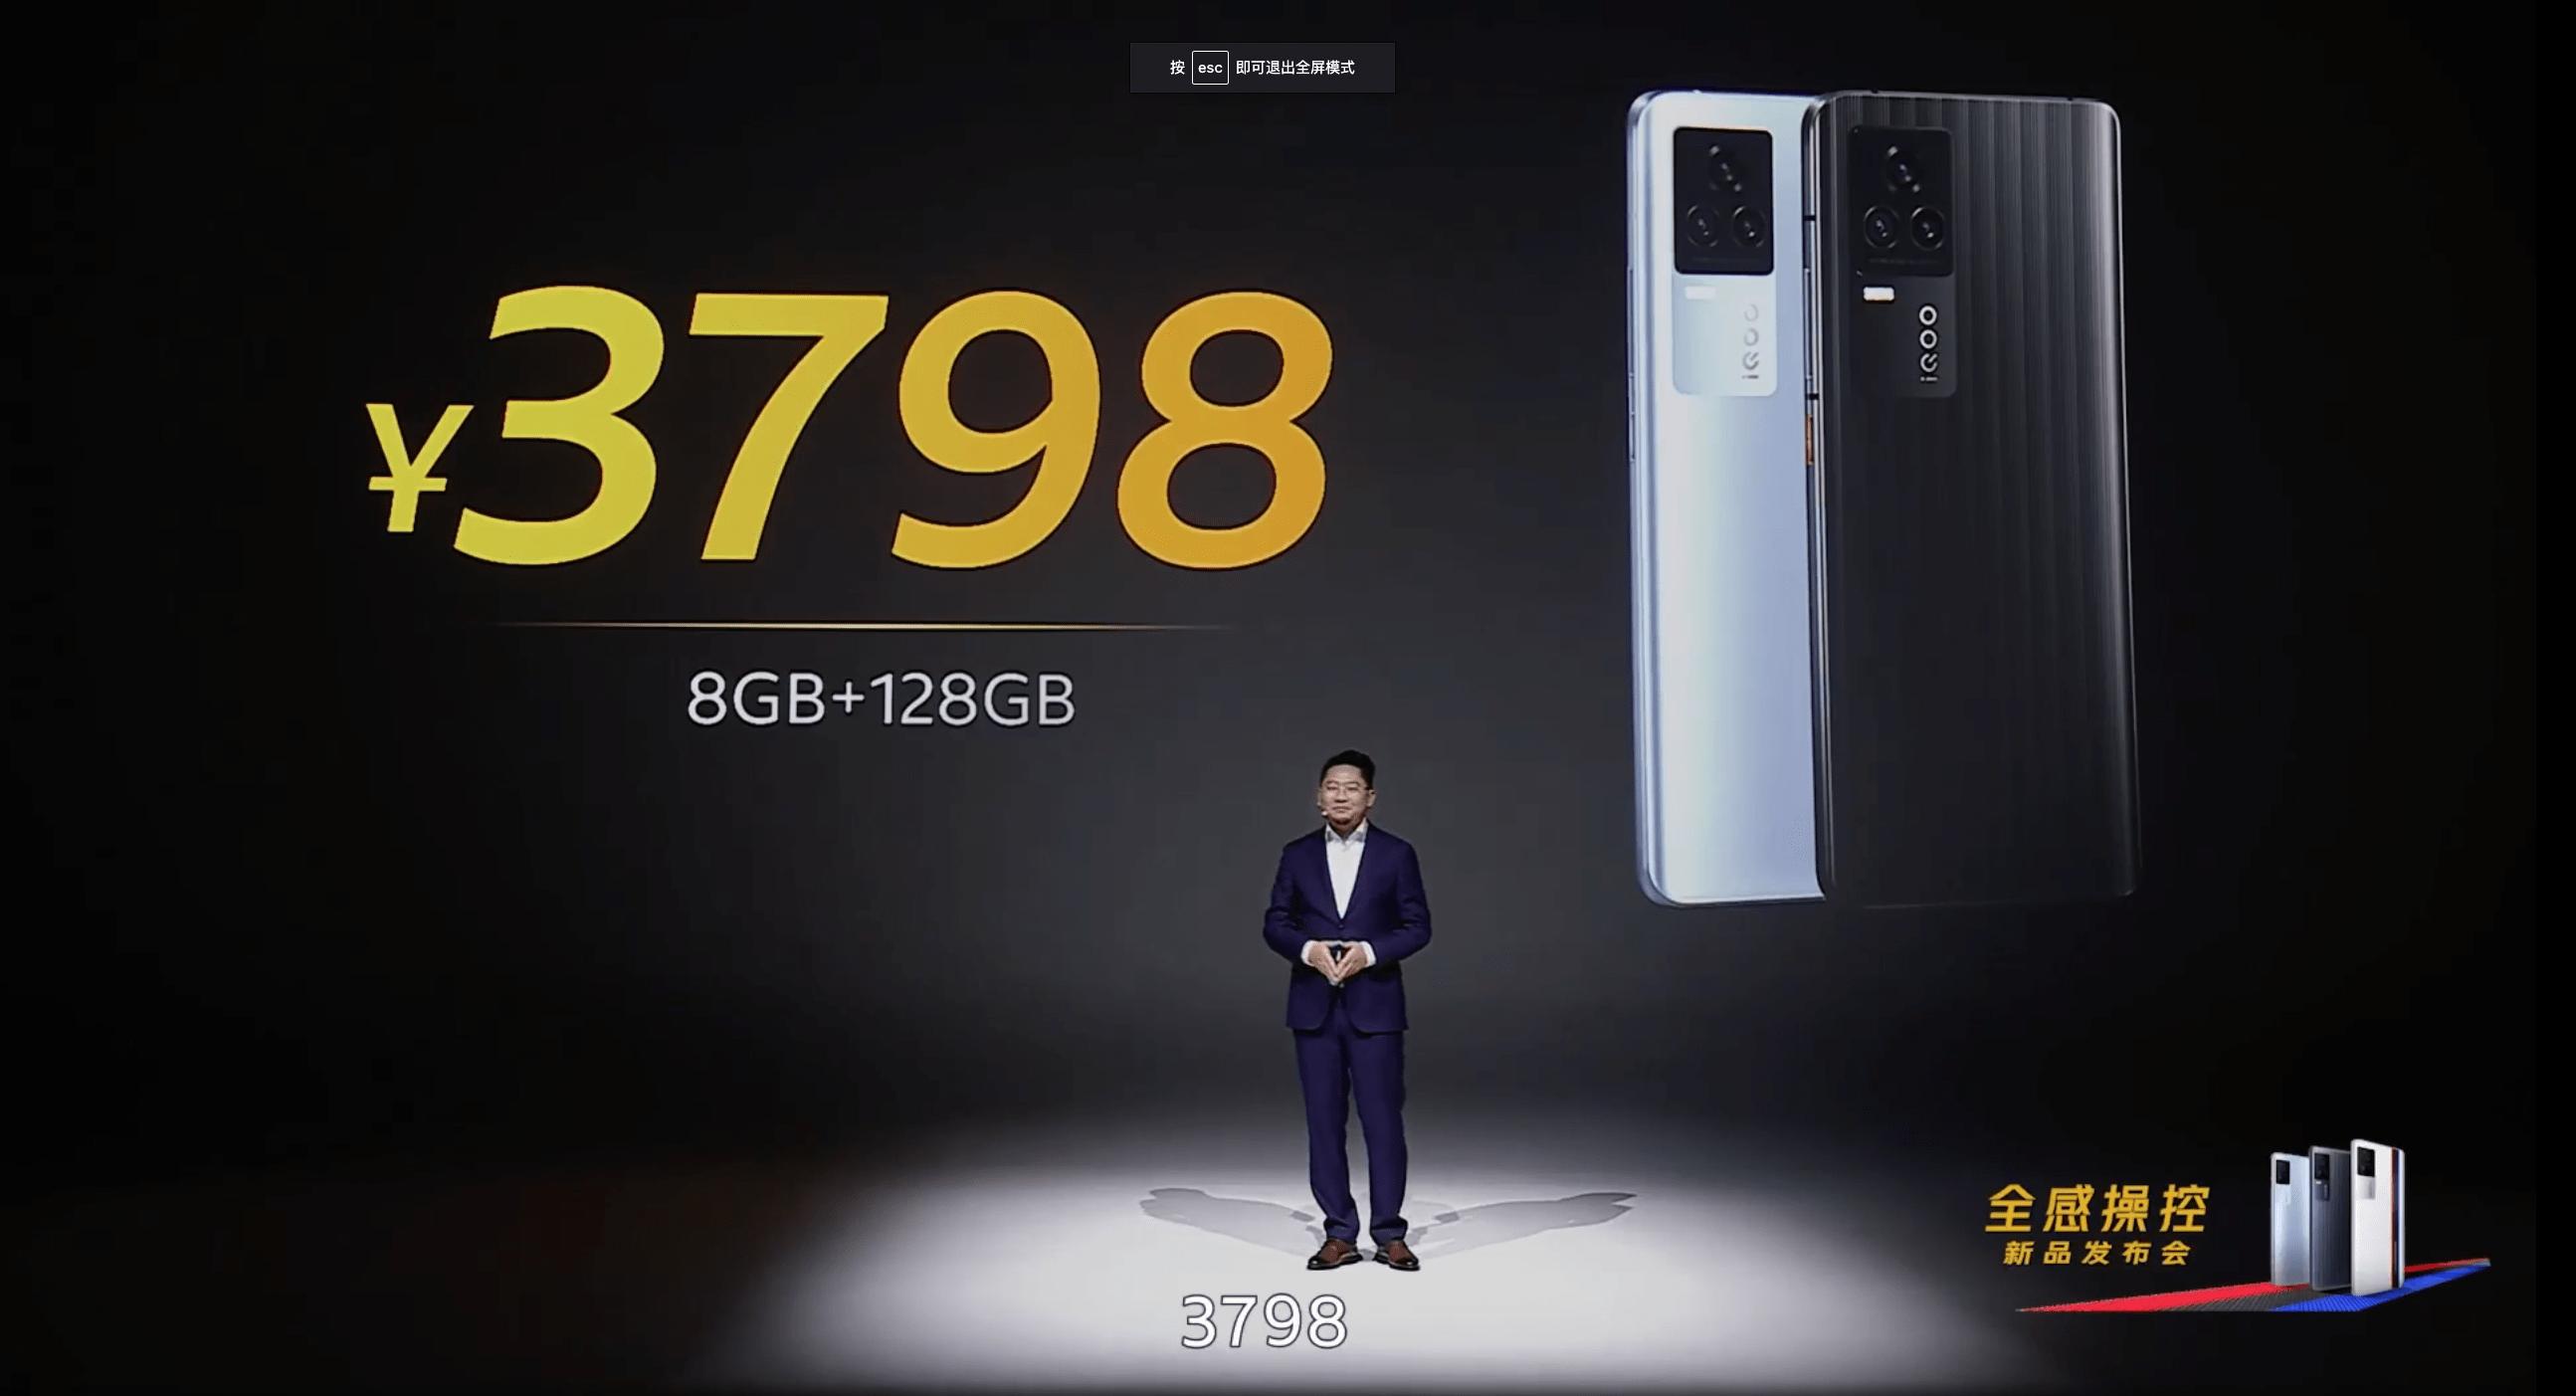 iQOO7价格公布:3798元起步,这价格你买么?